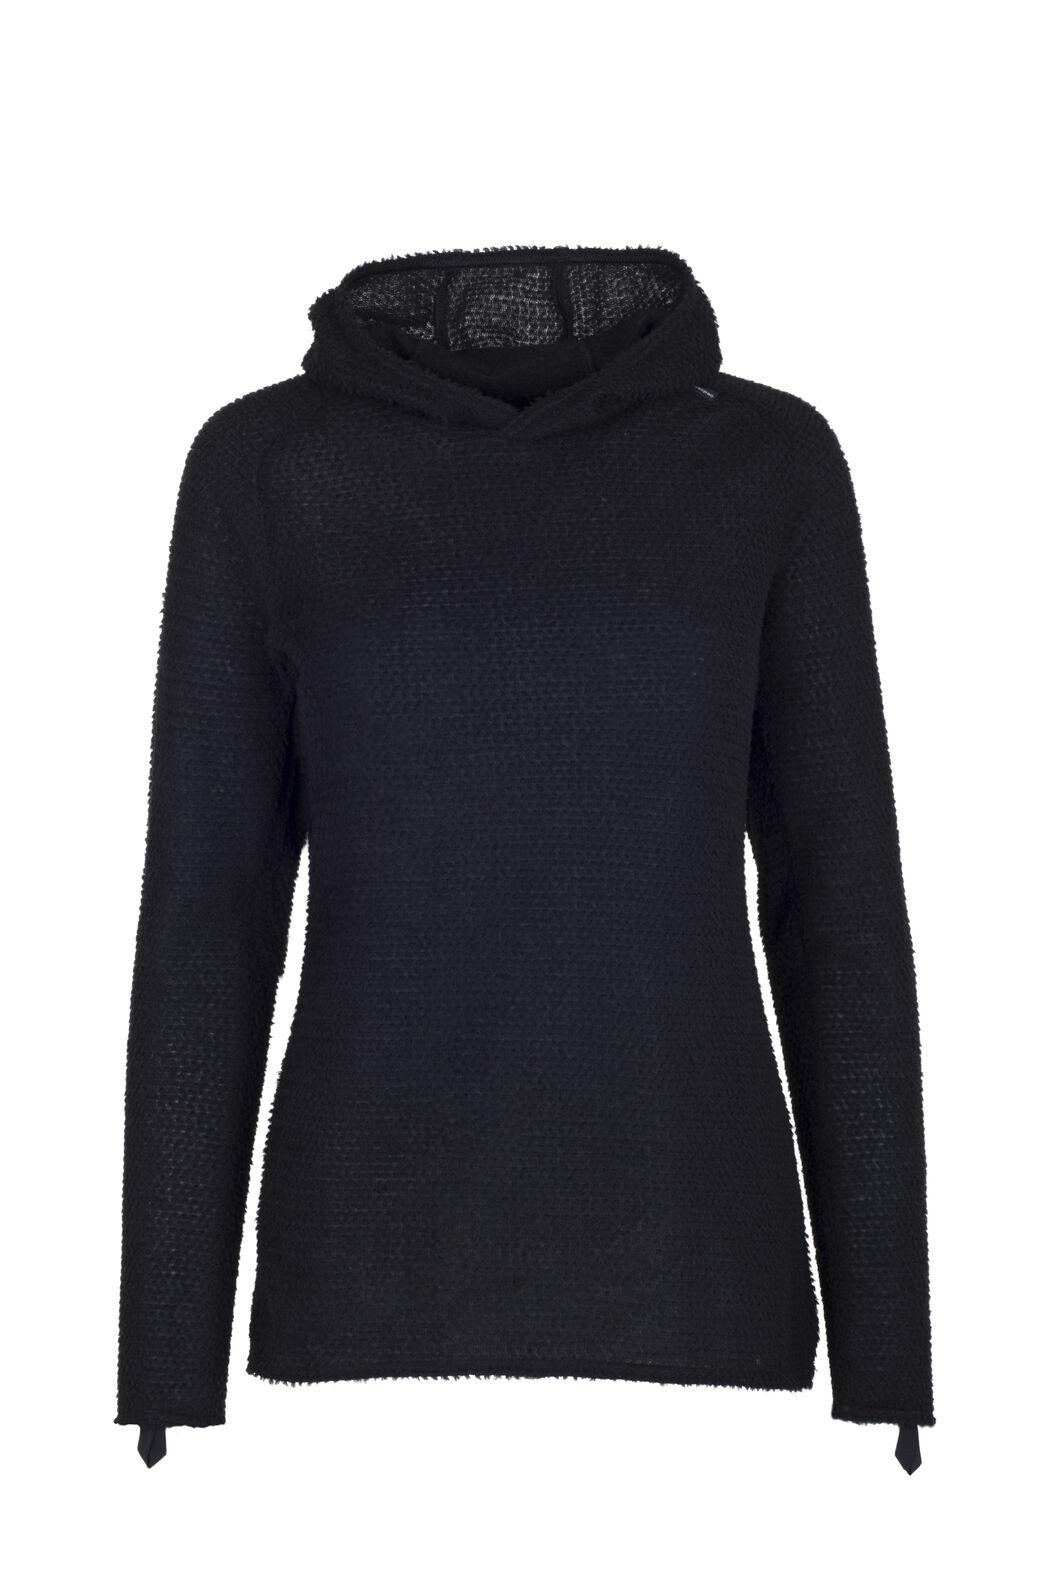 Macpac Nitro Polartec® Alpha® Pullover — Women's, Black, hi-res